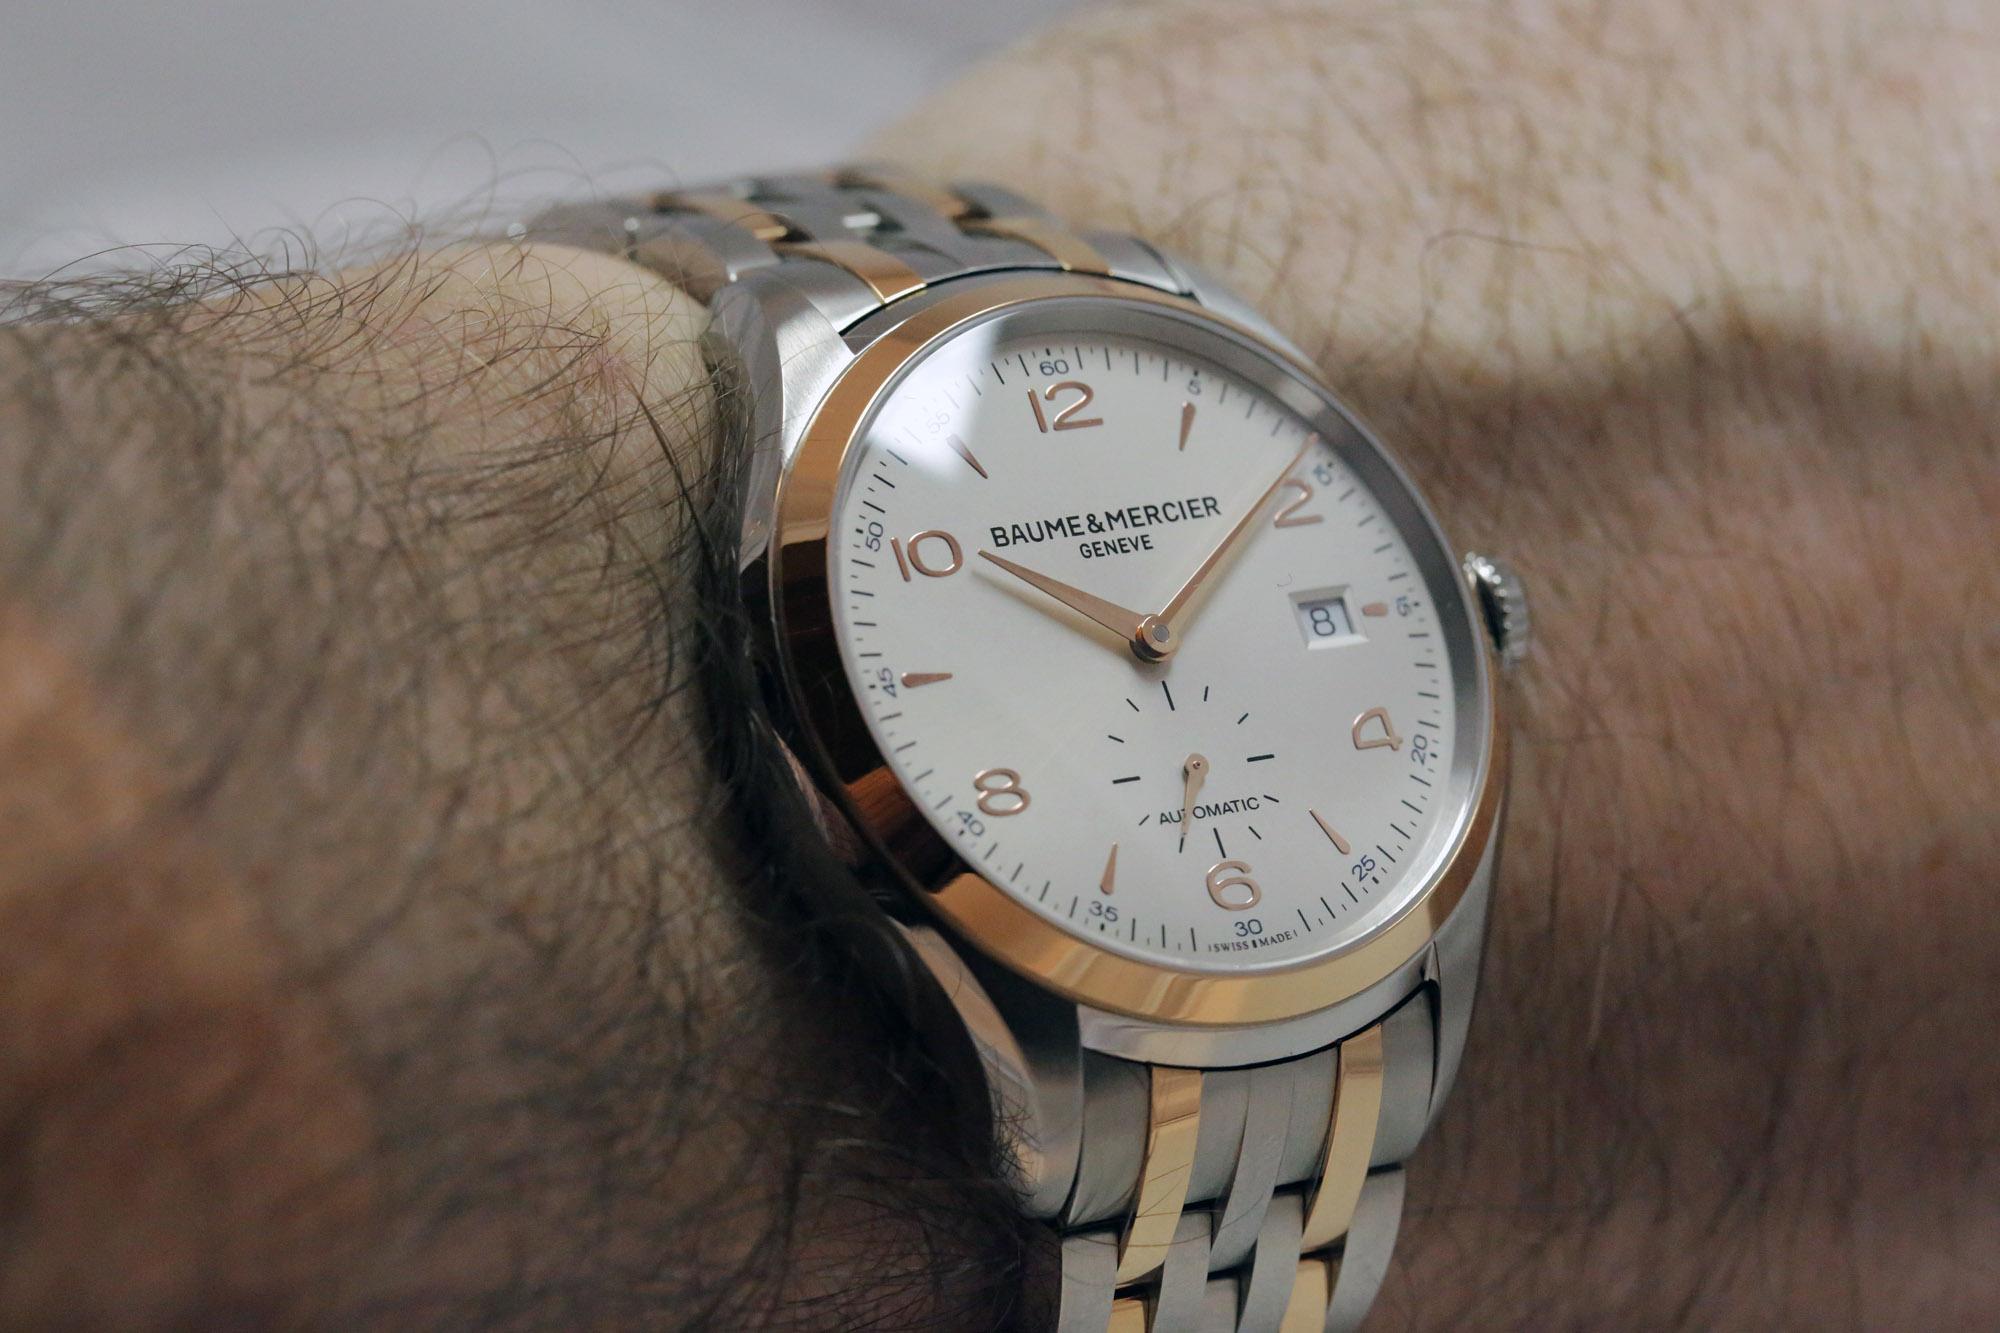 Baume & Mercier Clifton Ref. 10140 - Wristshot